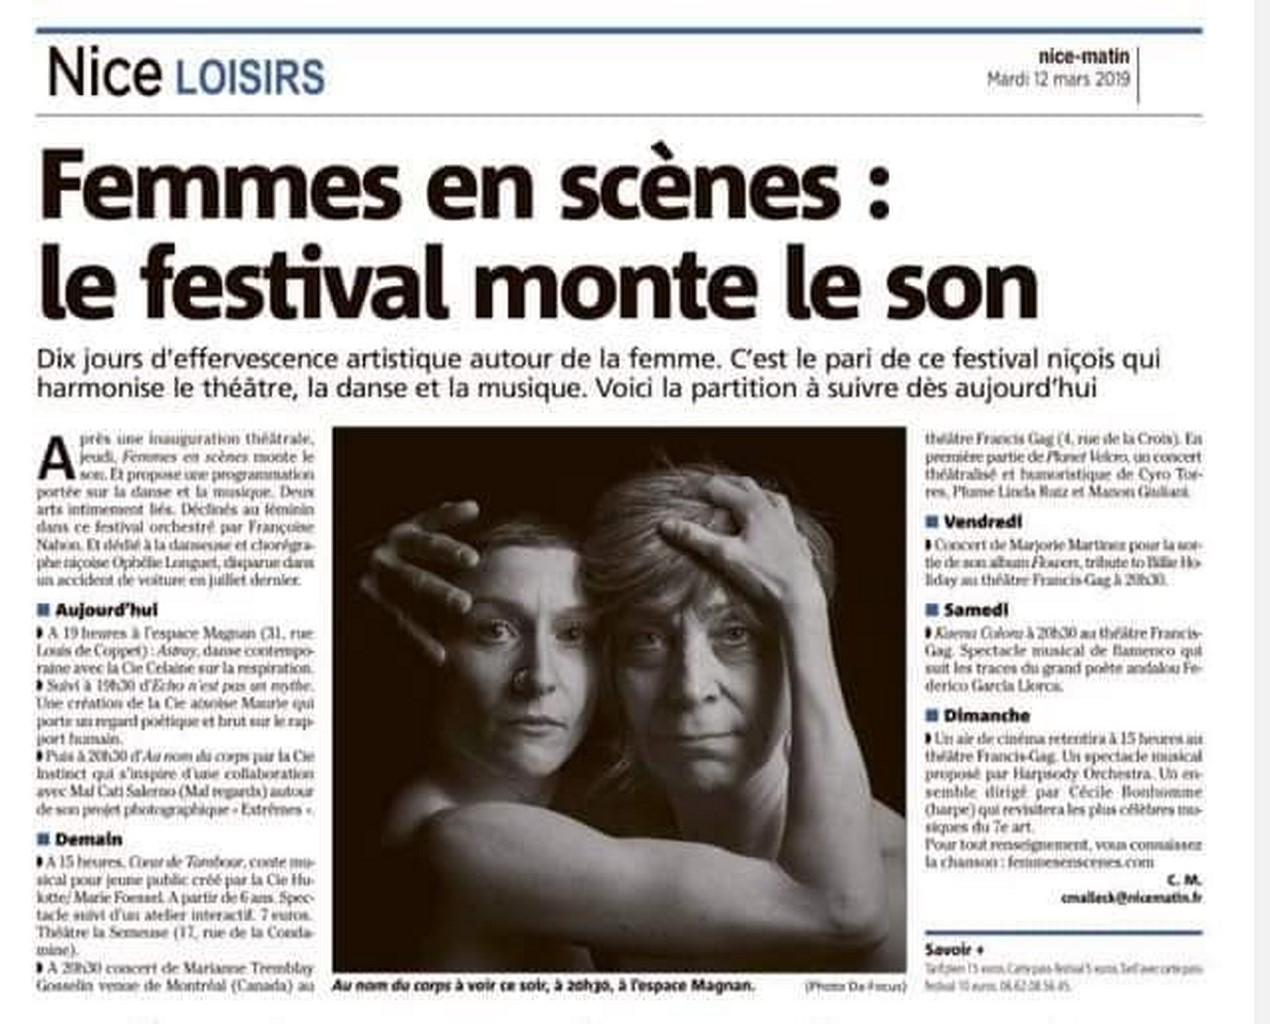 Marie-Pierre Genovese ANDC-FES Presse